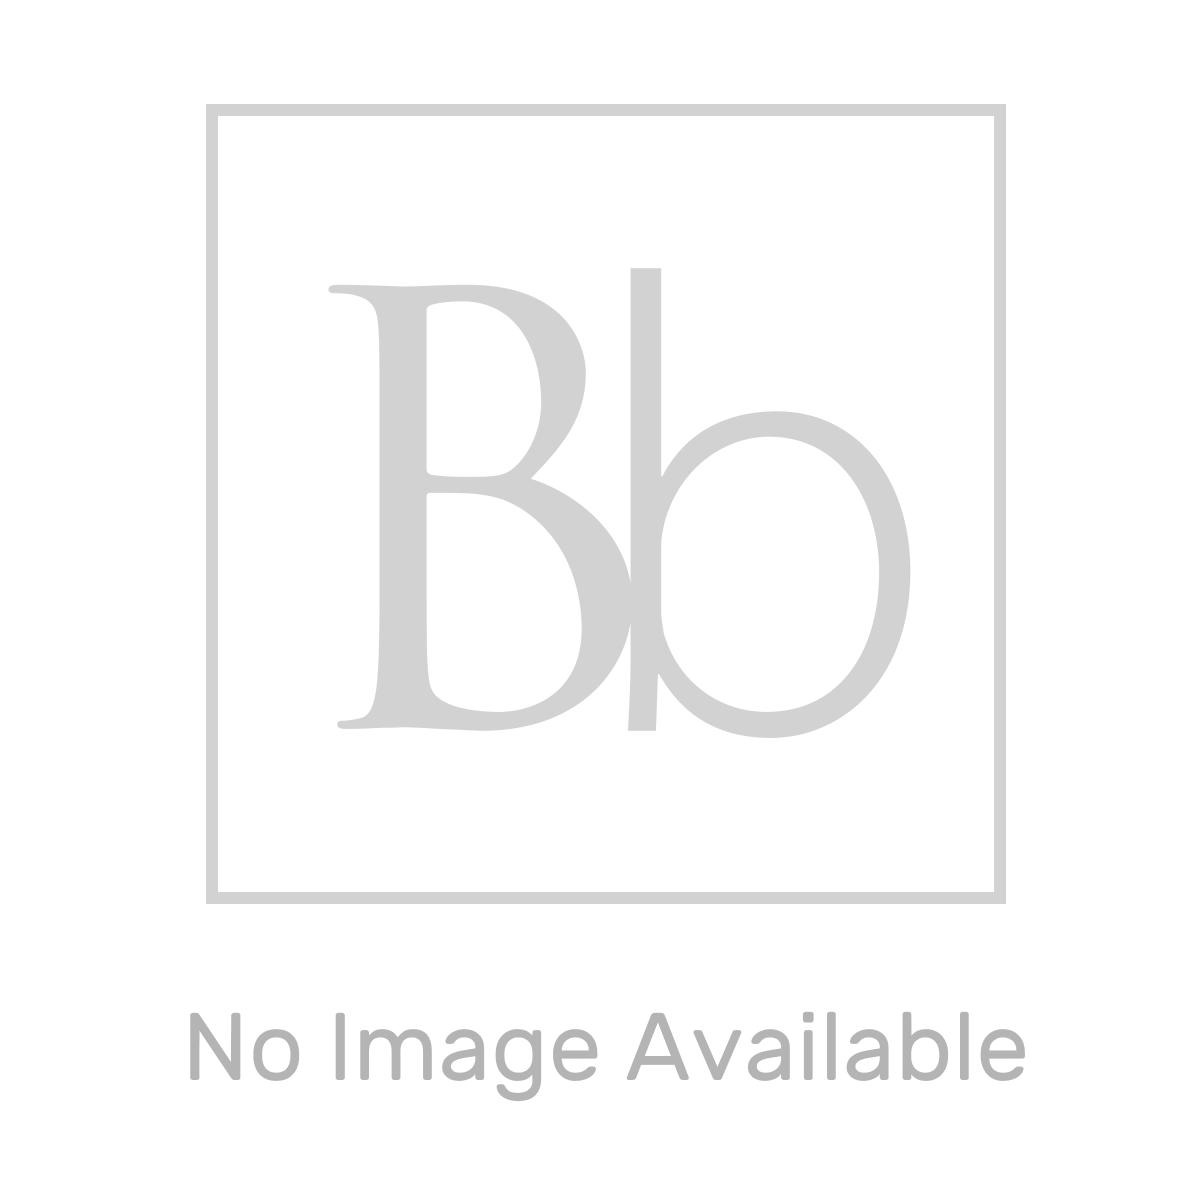 Kartell Astley Matt Grey End Bath Panel 750mm